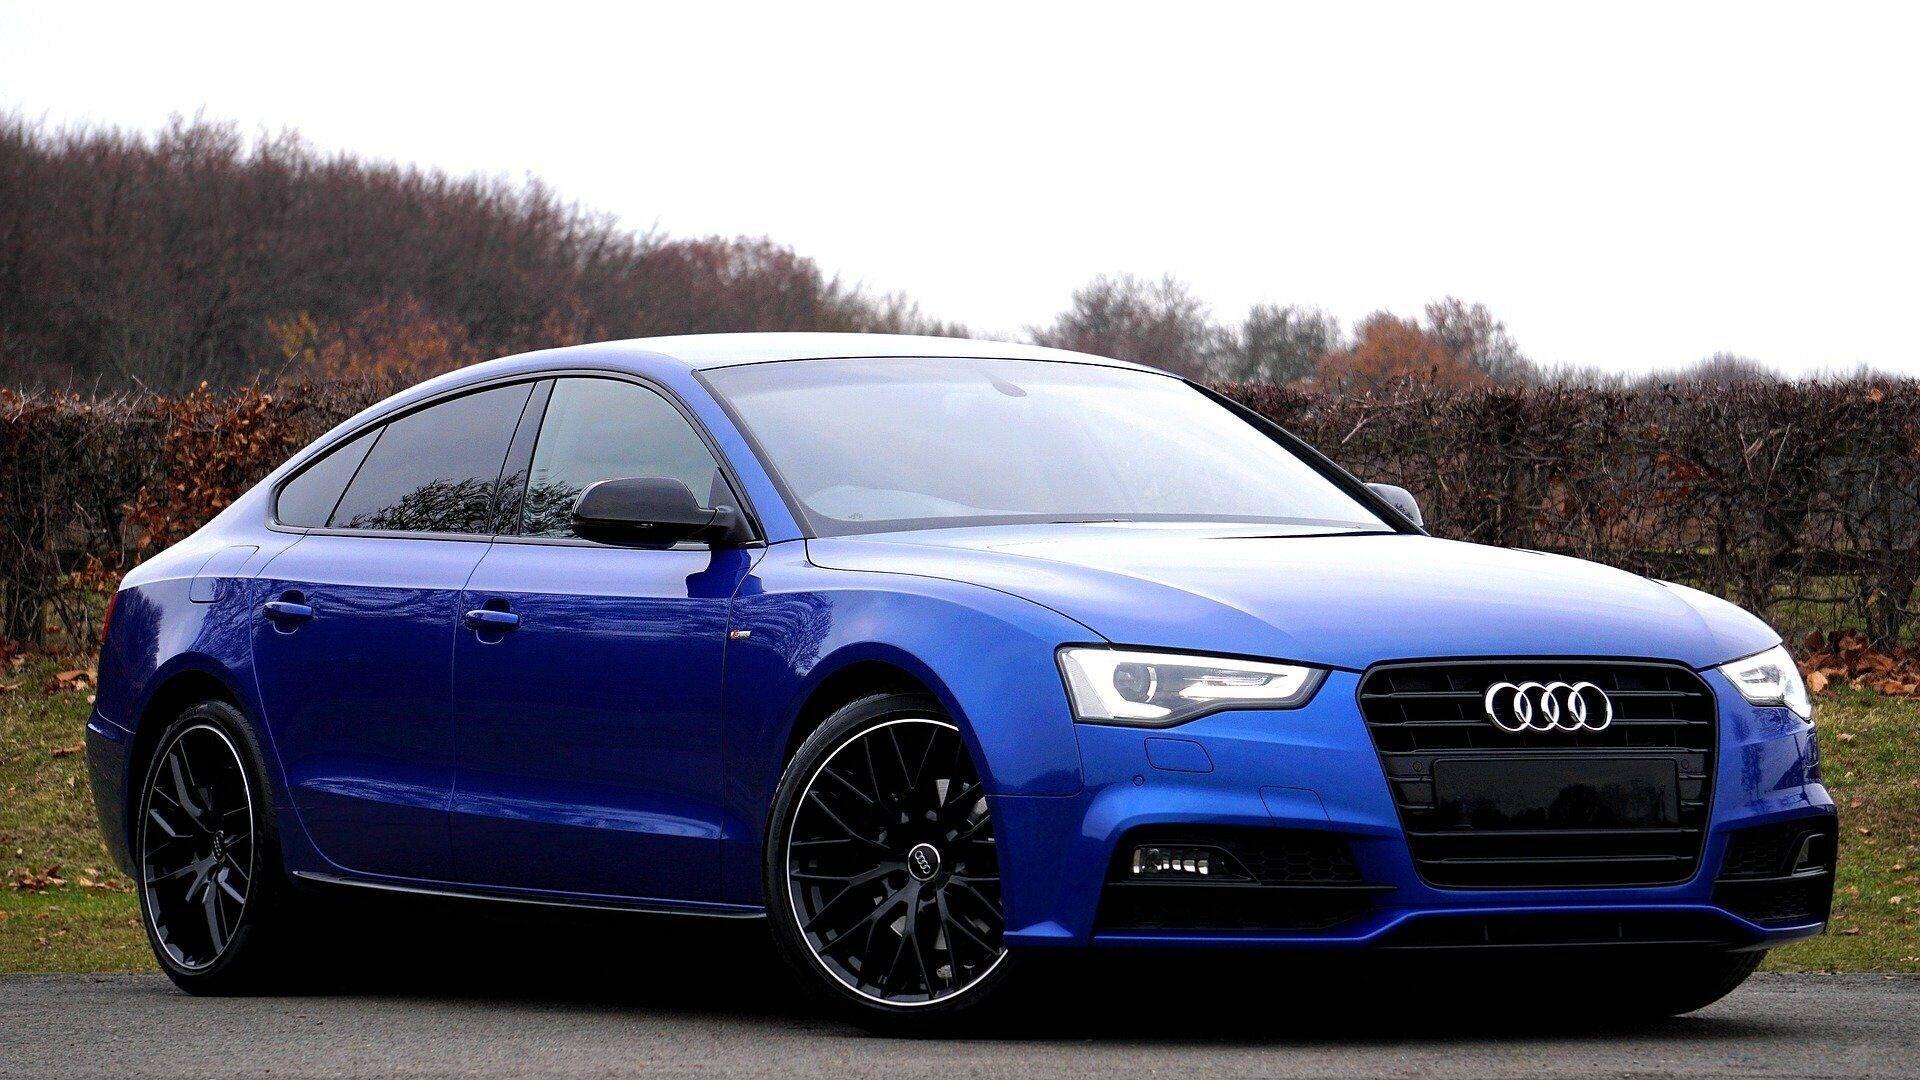 Audi A5 Side View